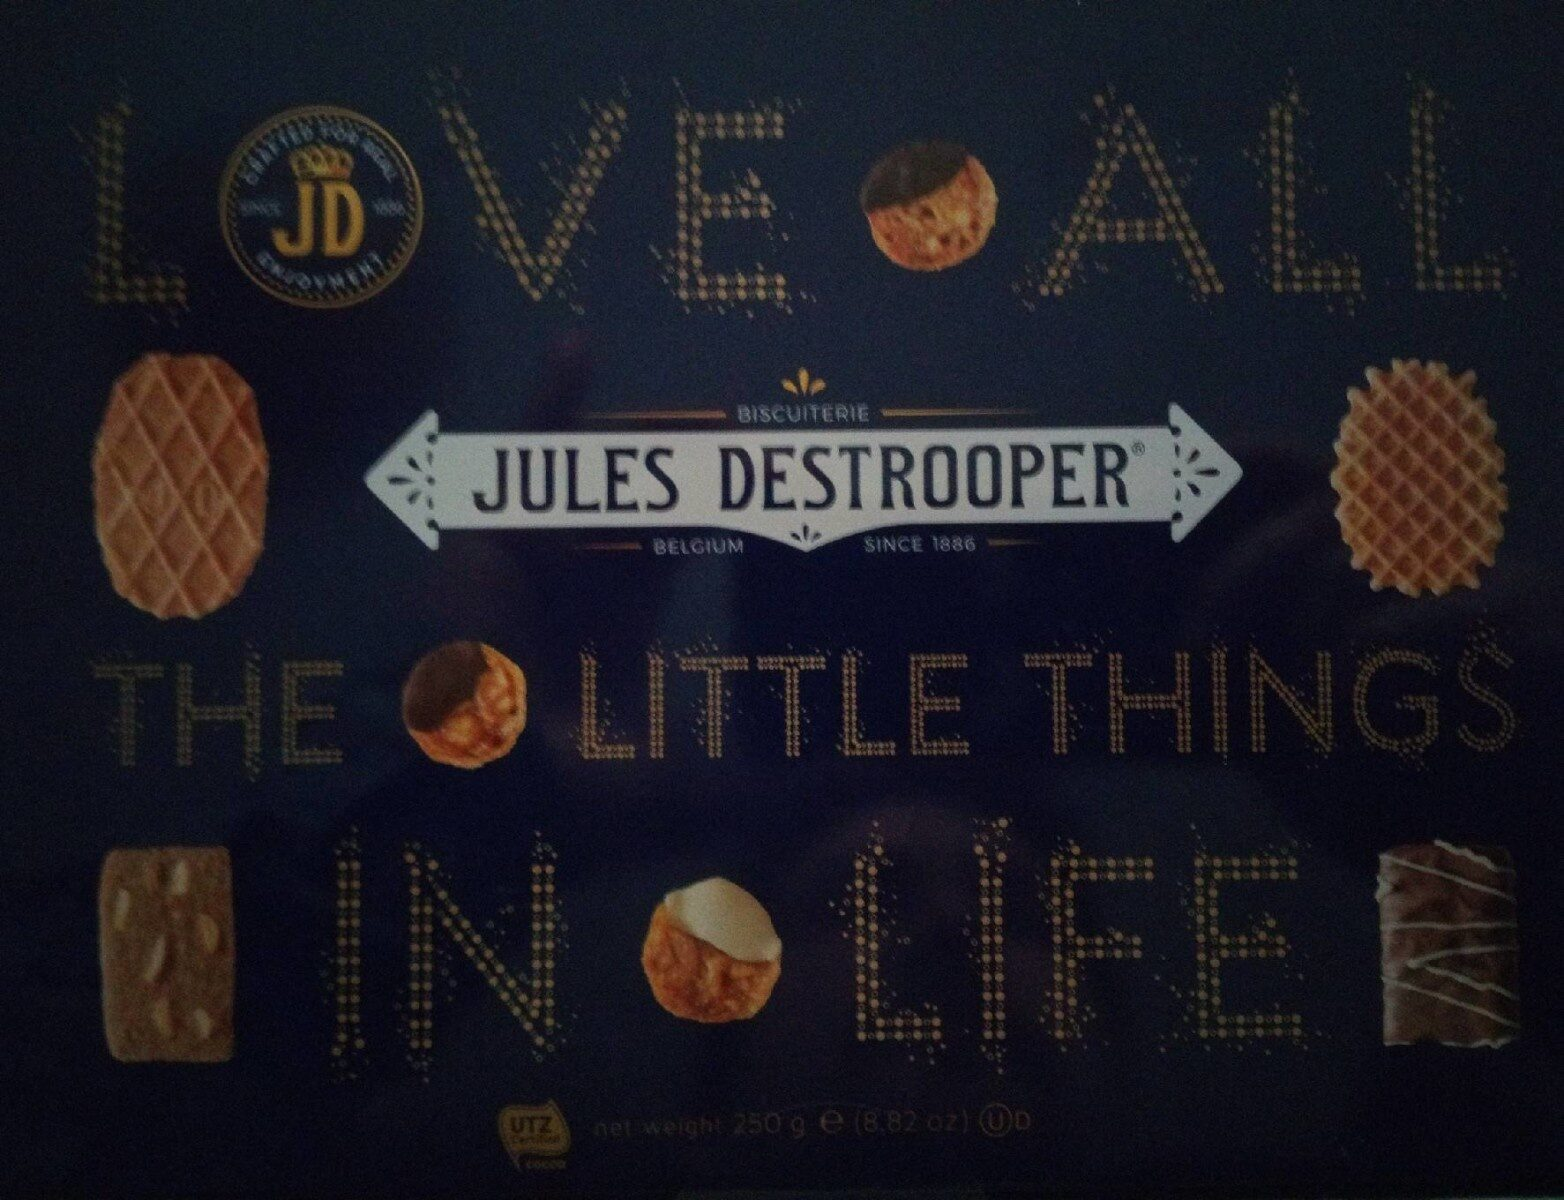 Jules Destrooper - Product